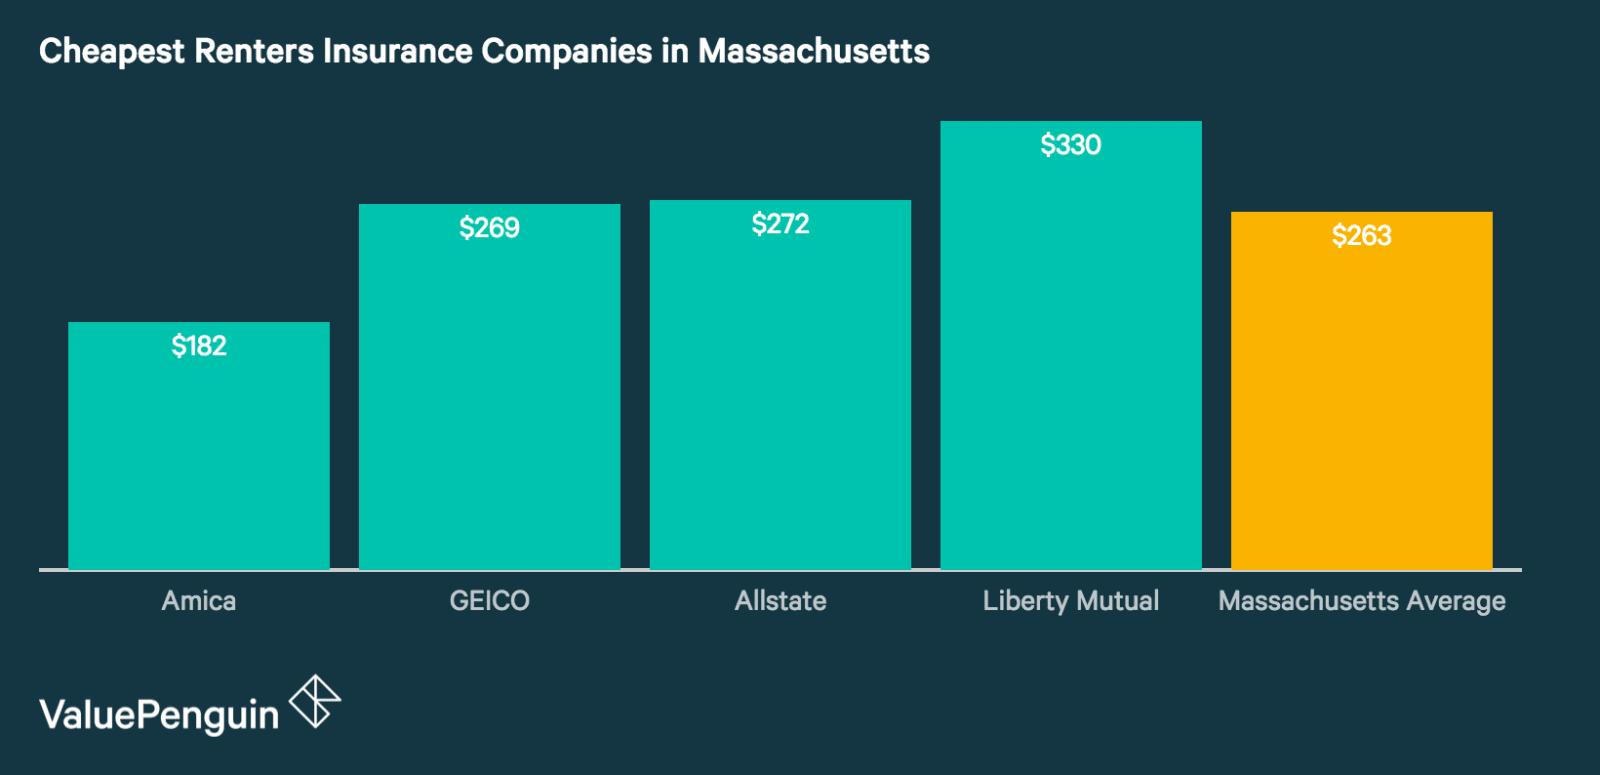 Best Renters Insurance Companies in Massachusetts